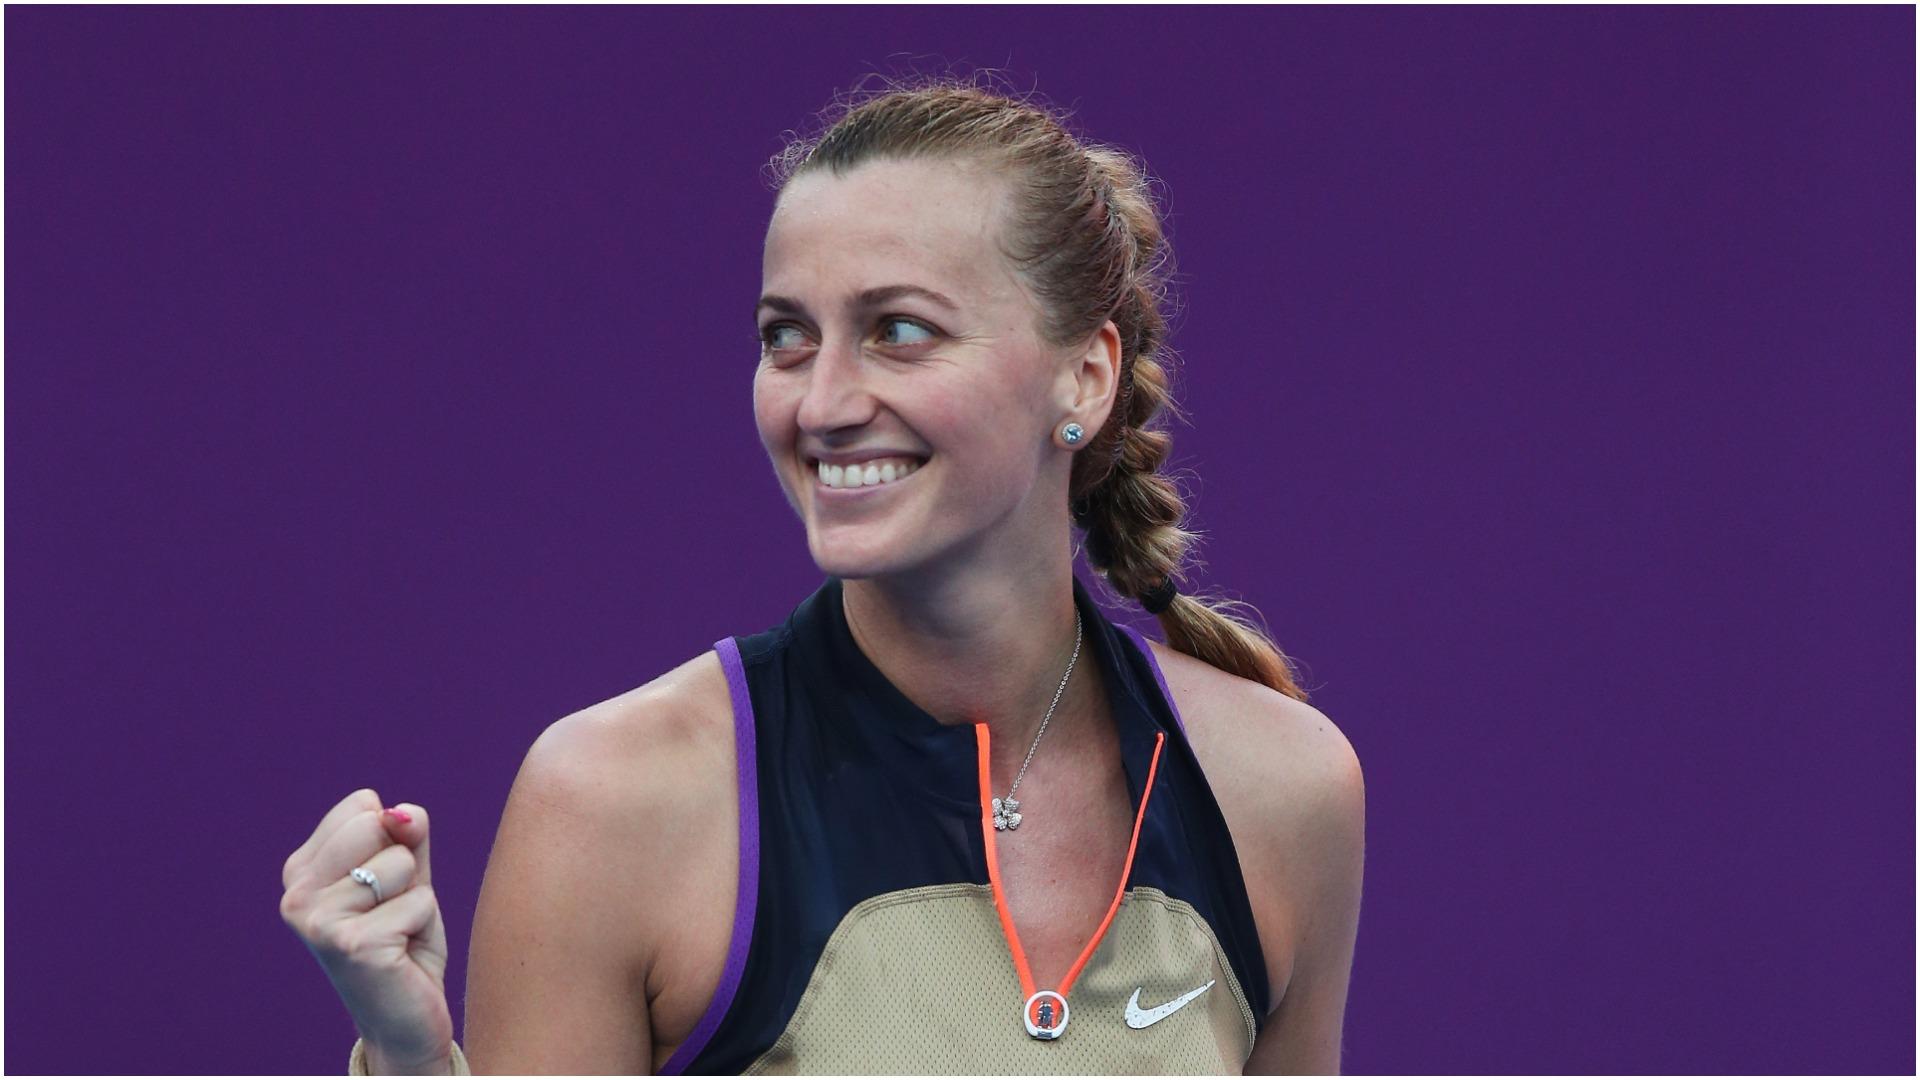 Kvitova reaches another Doha semi-final as Pegula ousts Pliskova